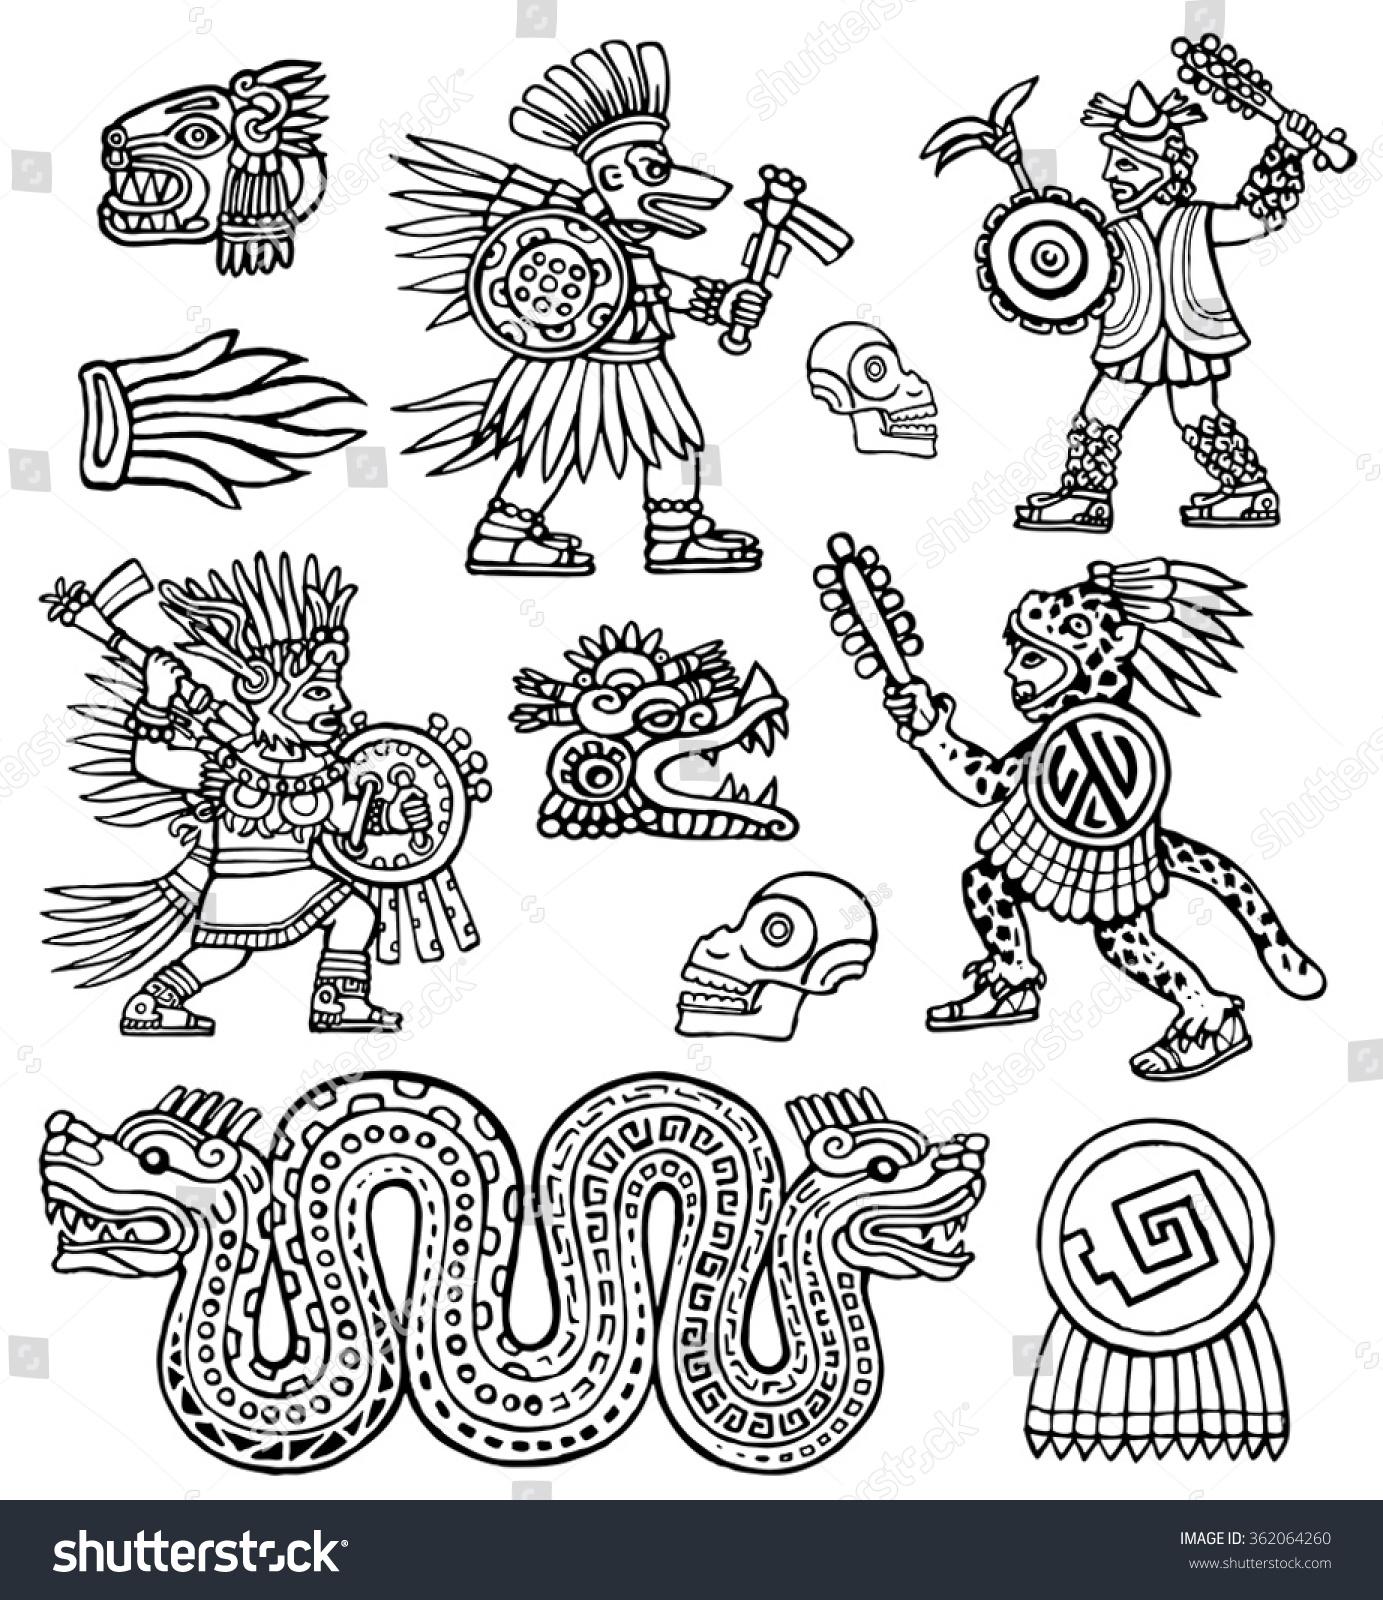 Ancient Aztec Warrior Symbols Images For Traditional Aztec